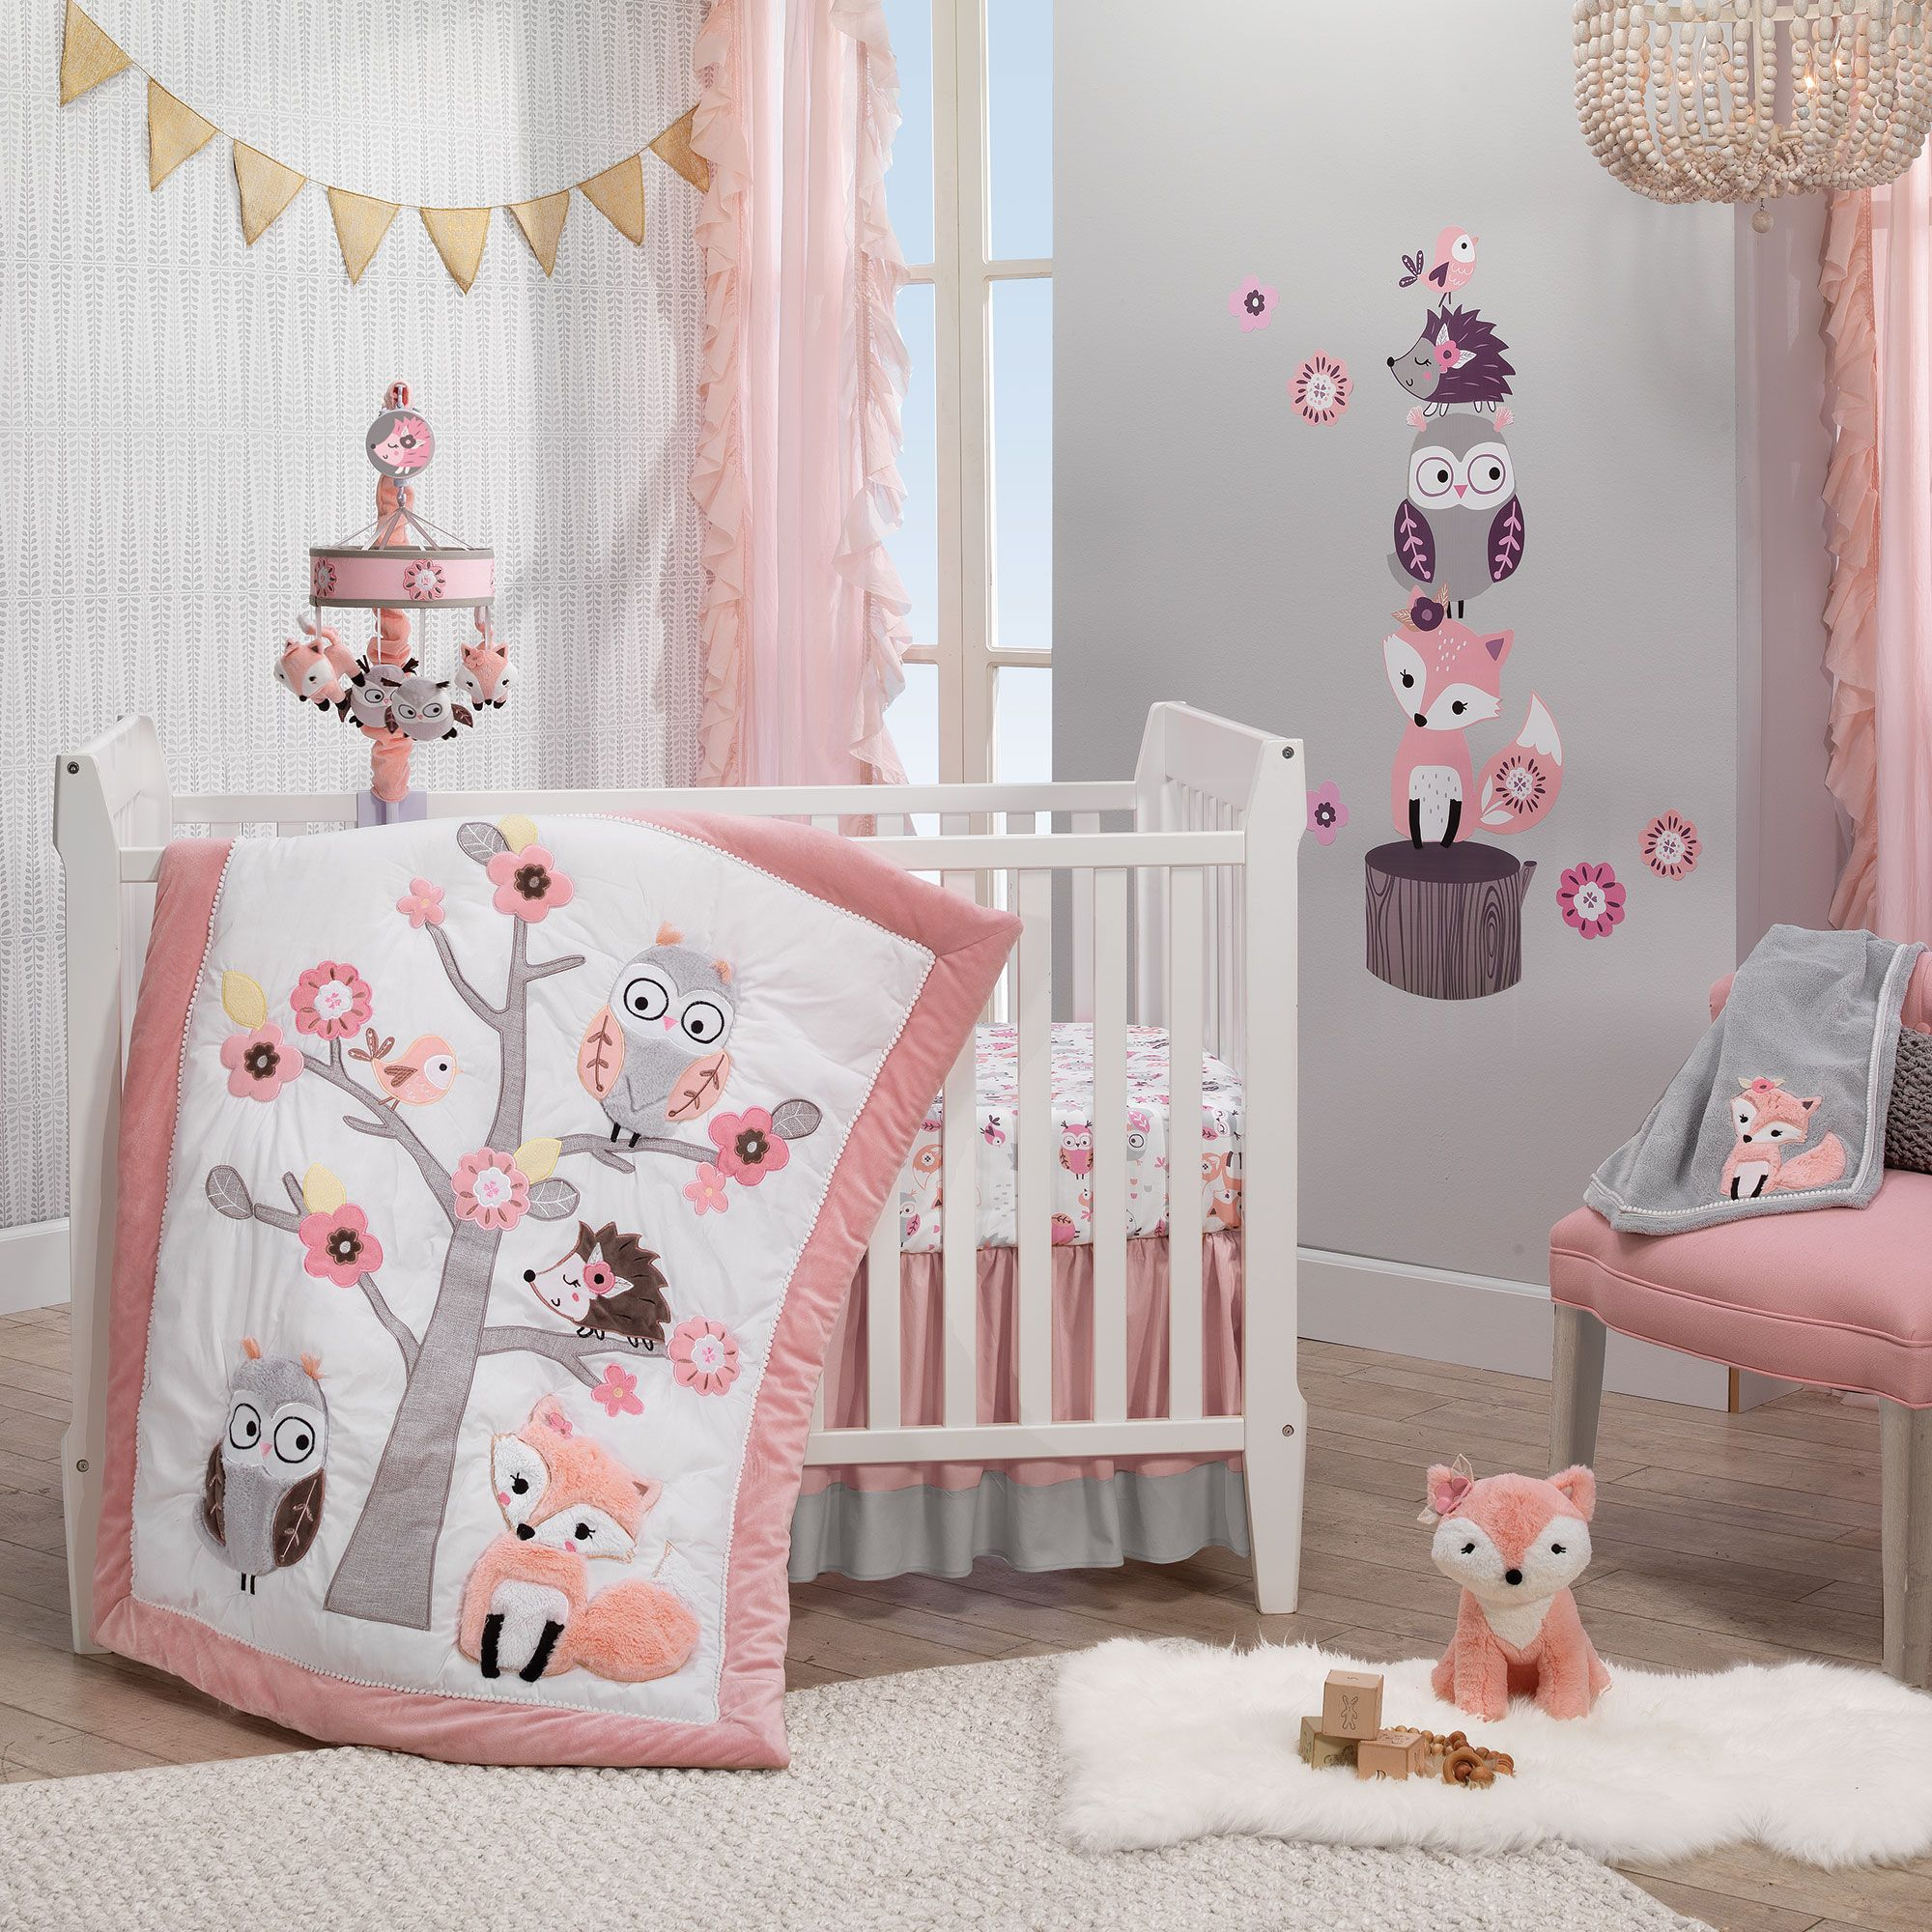 Friendship Tree Baby Blanket Baby Crib Bedding Sets Baby Crib Bedding Nursery Bedding Sets